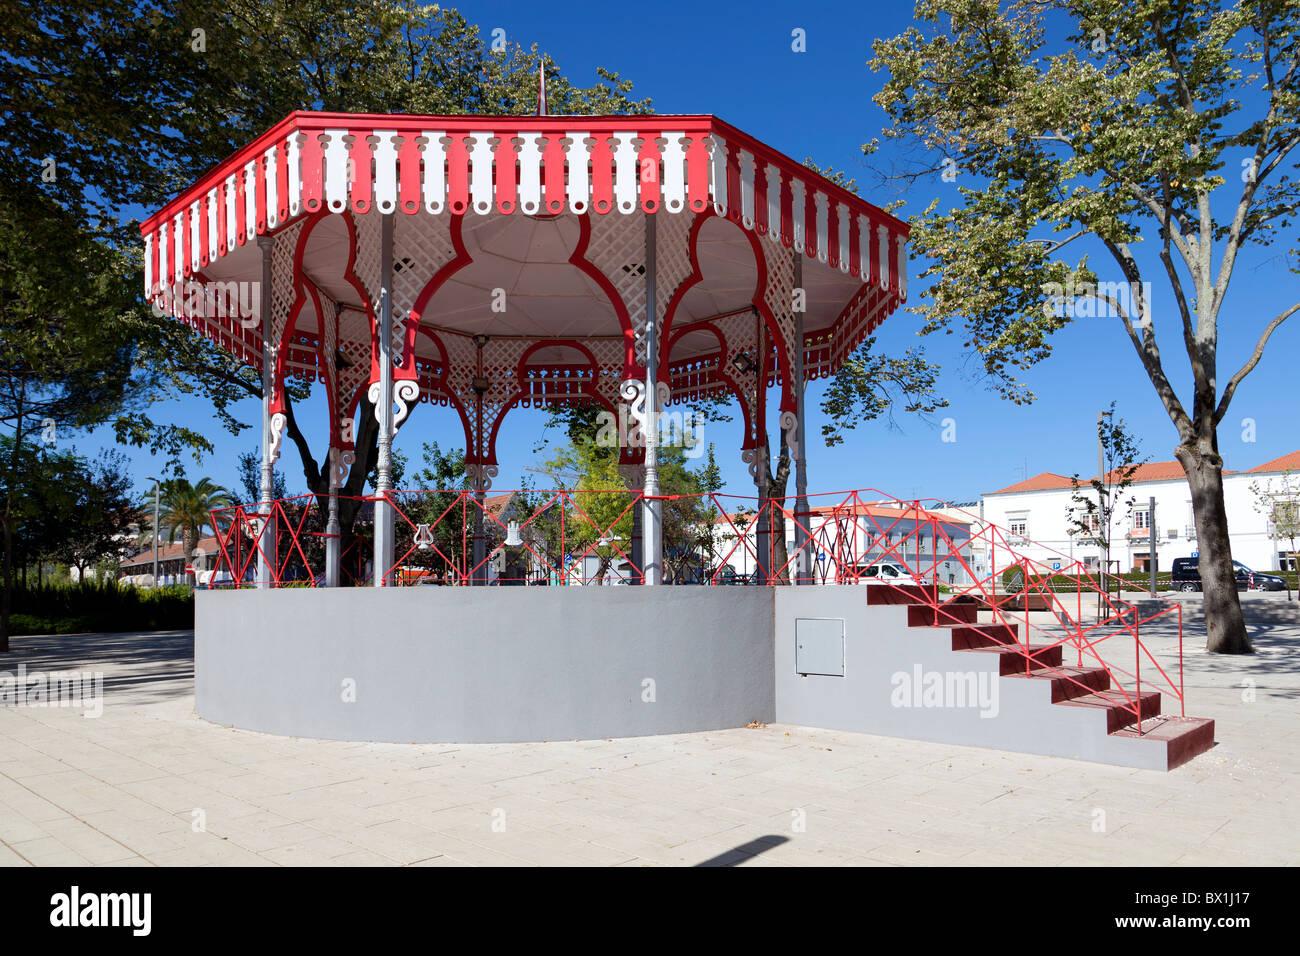 Bandstand in Republica Garden in the city of Santarém, Portugal. - Stock Image